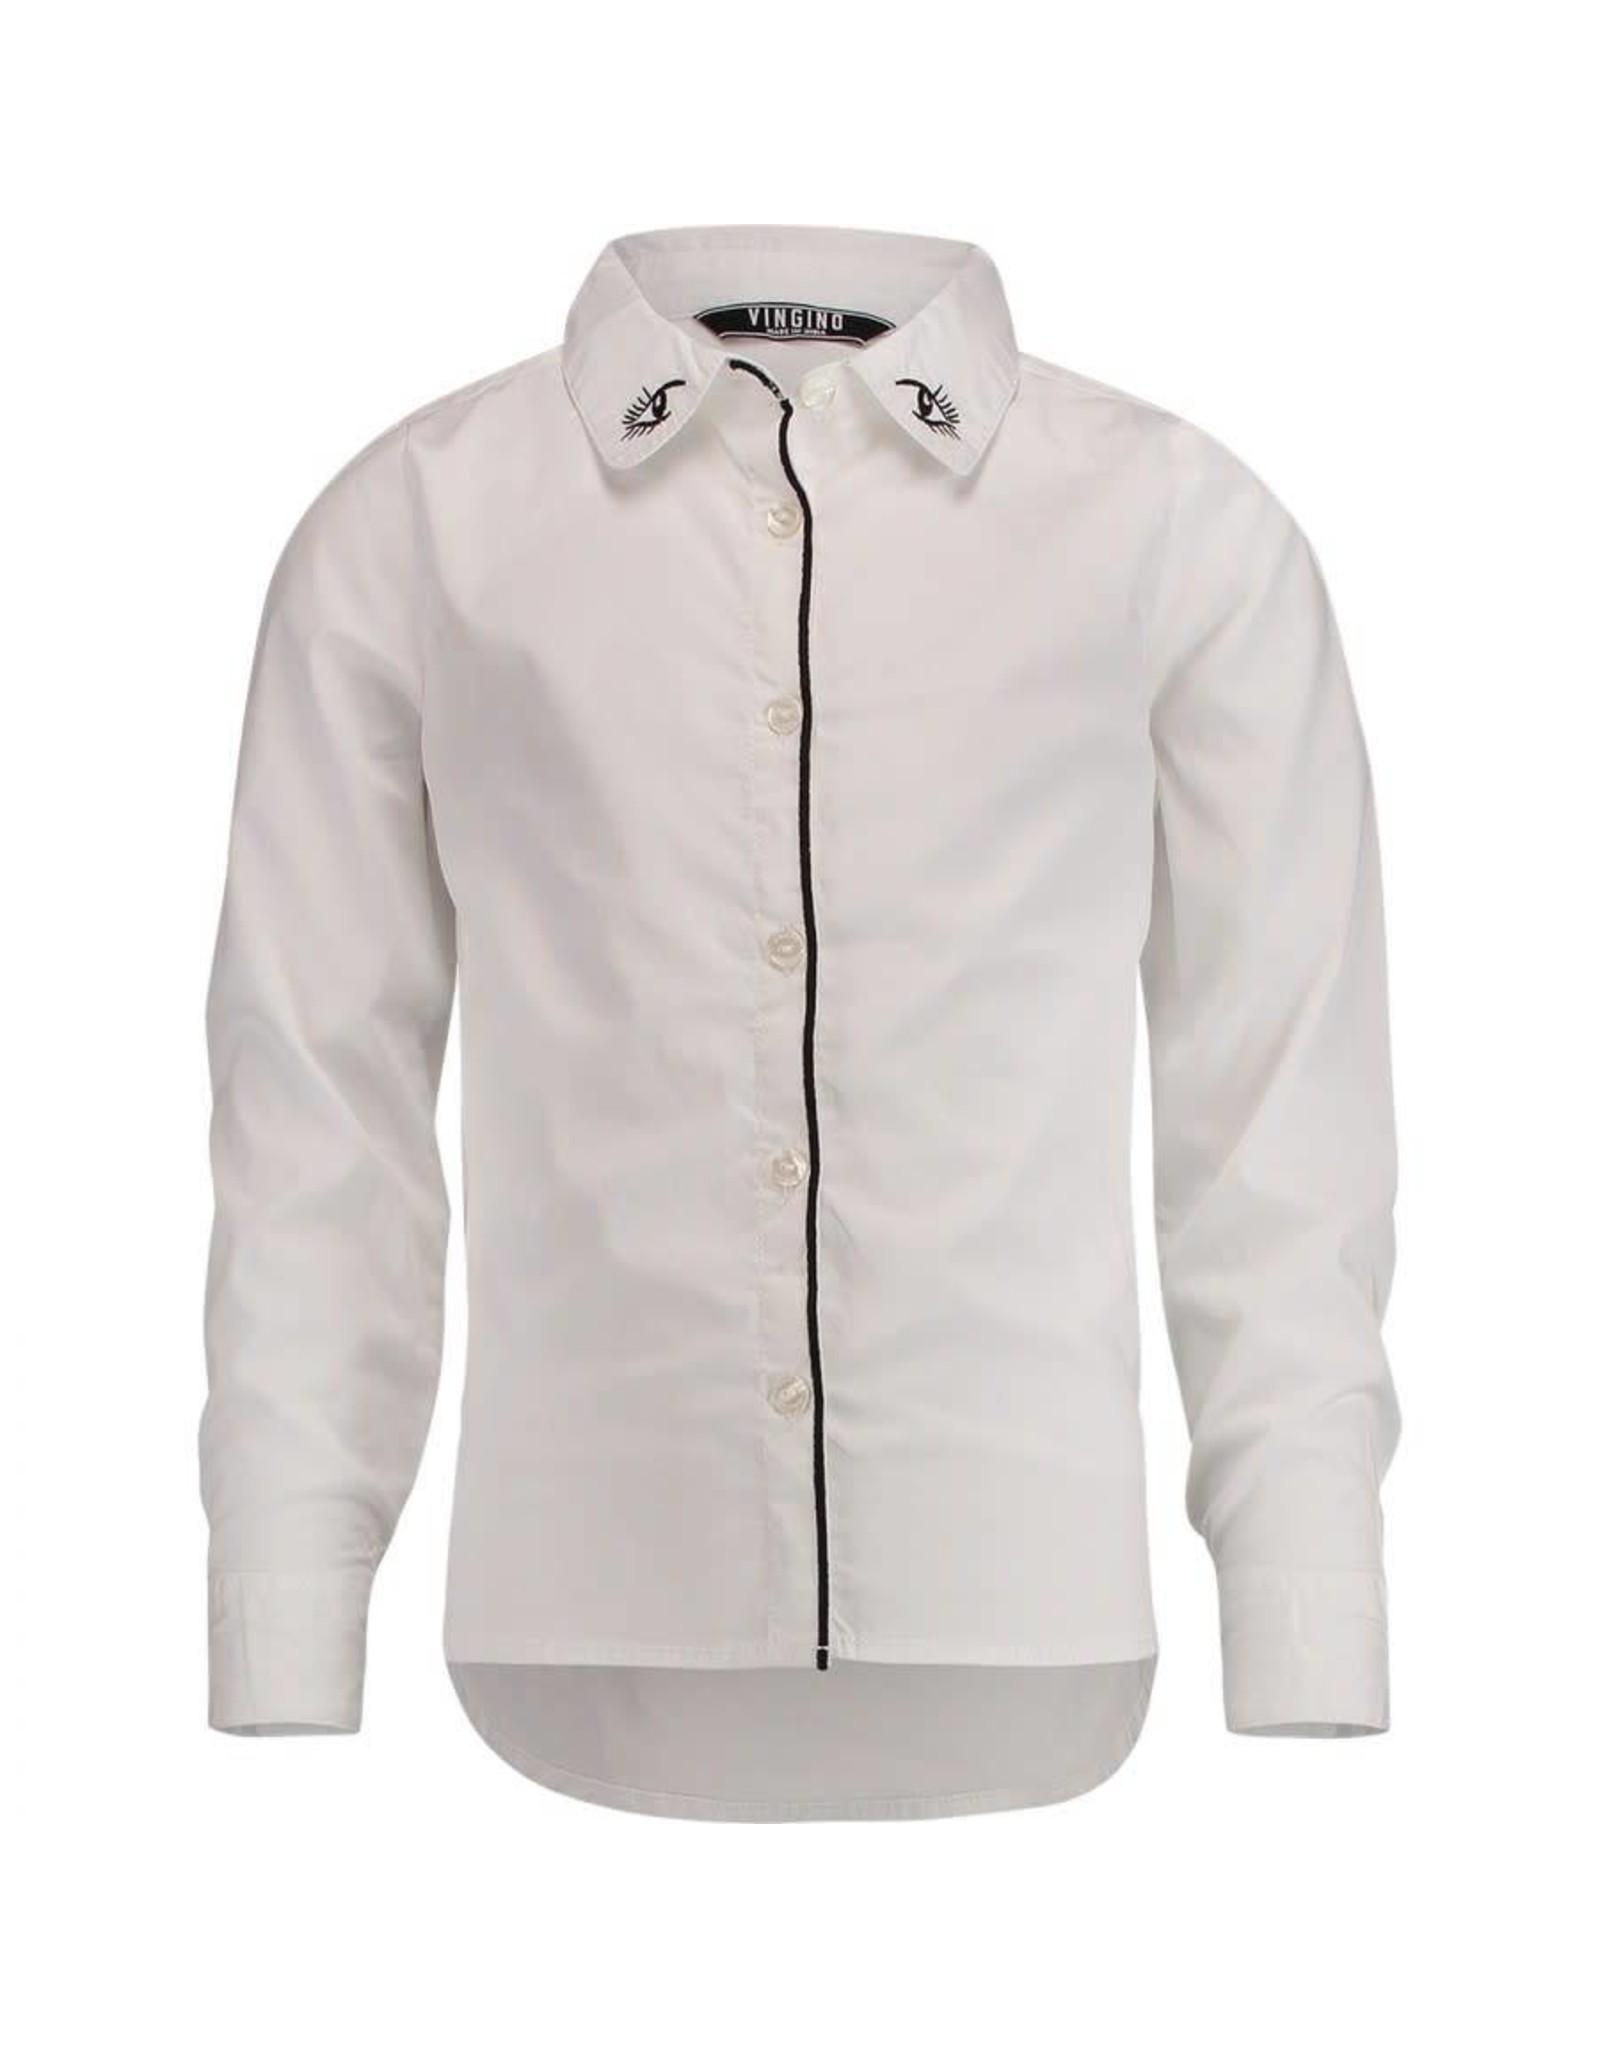 Vingino Lockata blouse 001 real white 176